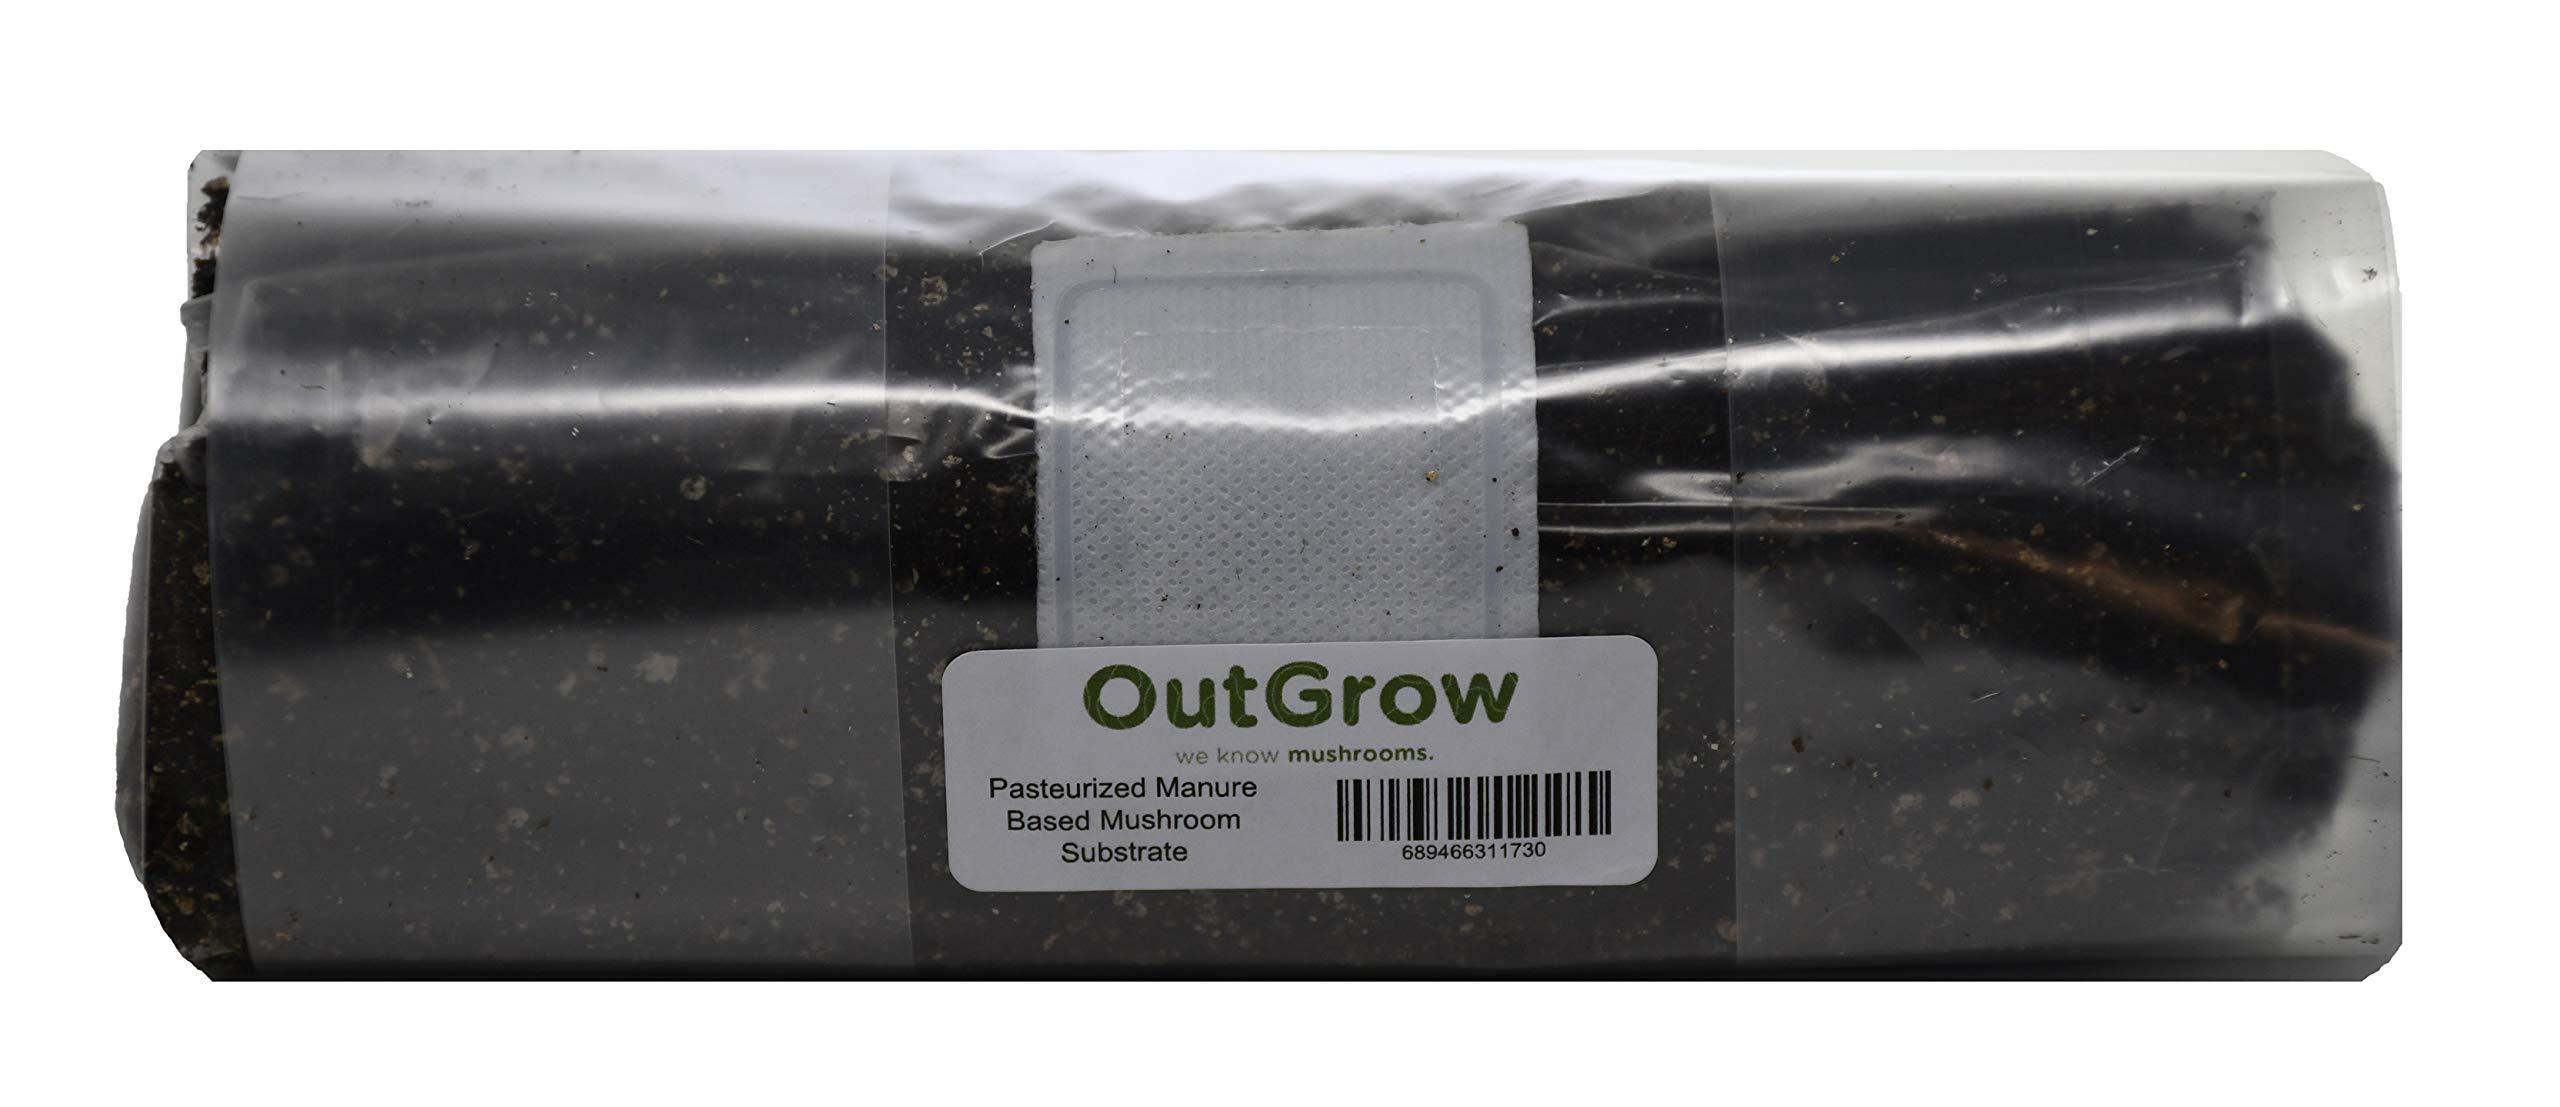 Pasteurized Manure Based Mushroom Substrate in Mushroom Grow Bag